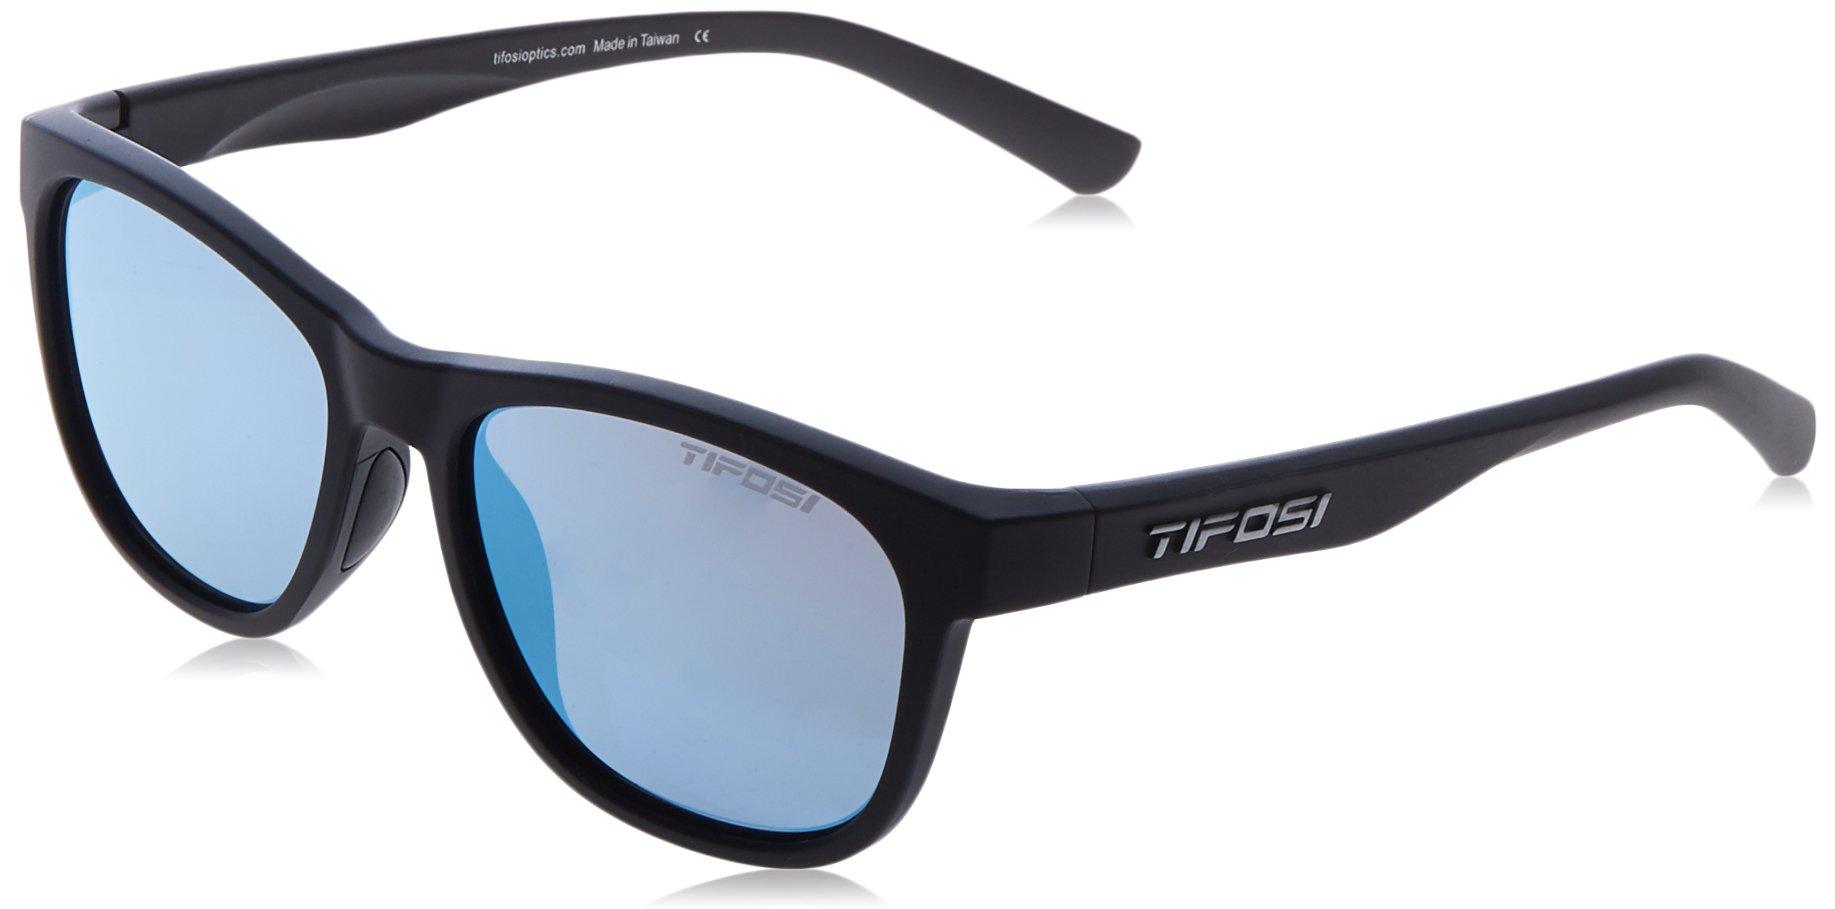 Tifosi Optics Swank Sunglasses Satin Black/Smoke Bright Blue Lenses by Tifosi